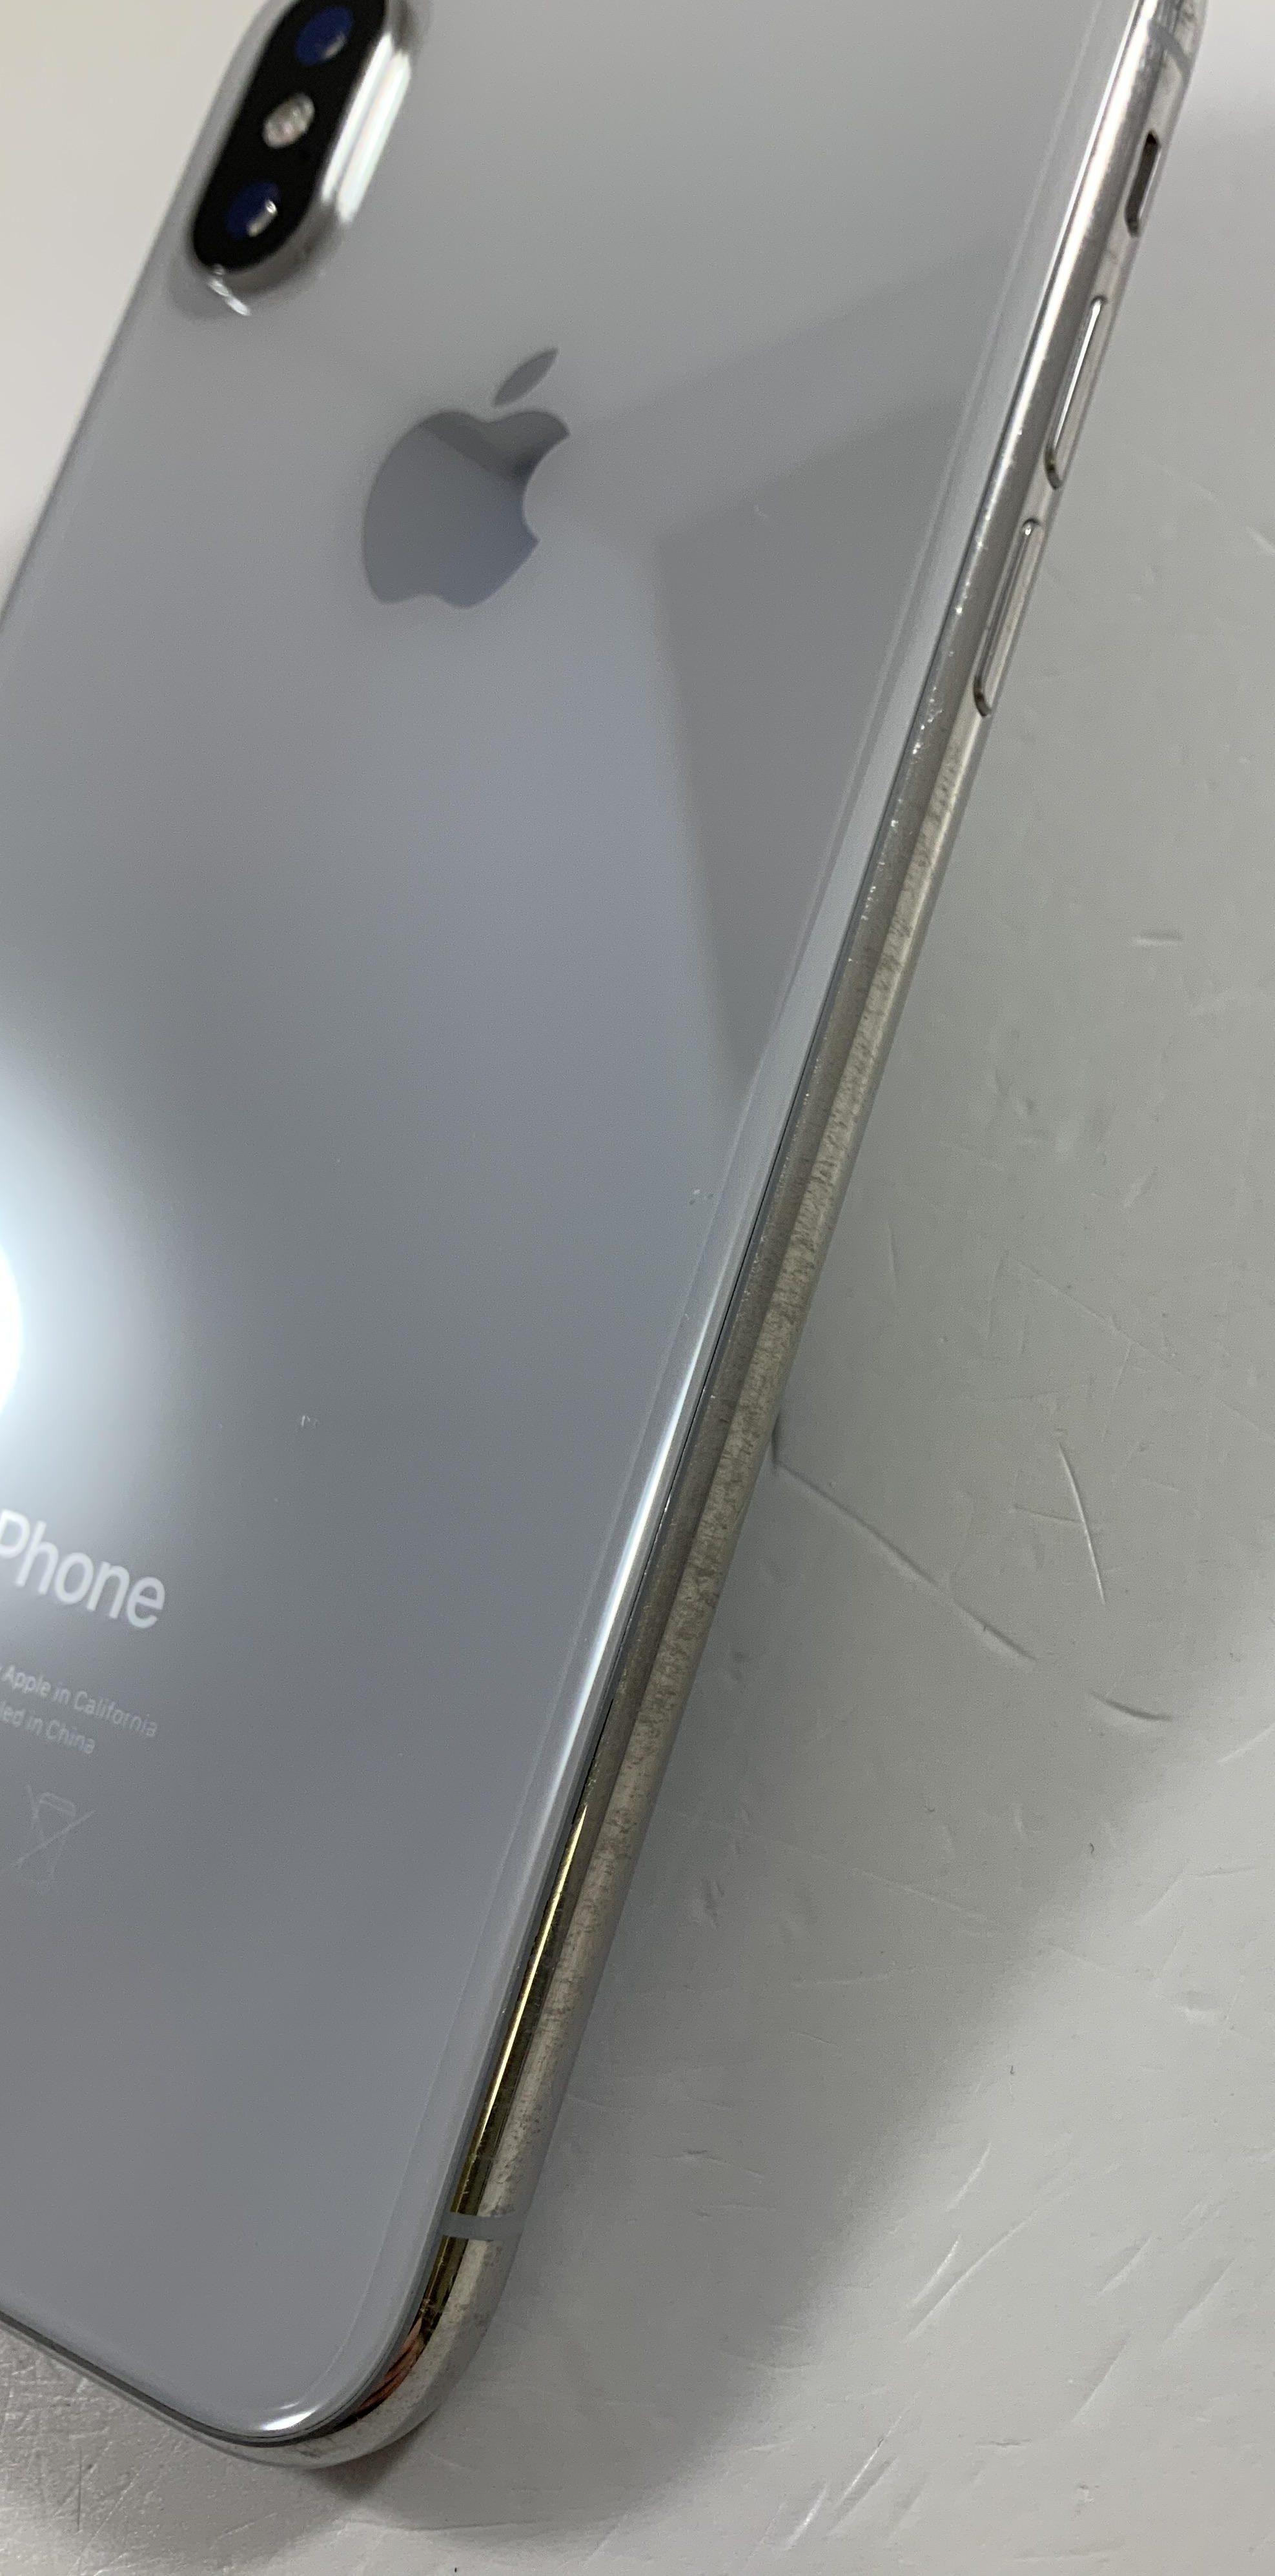 iPhone X 64GB, 64GB, Silver, Bild 5